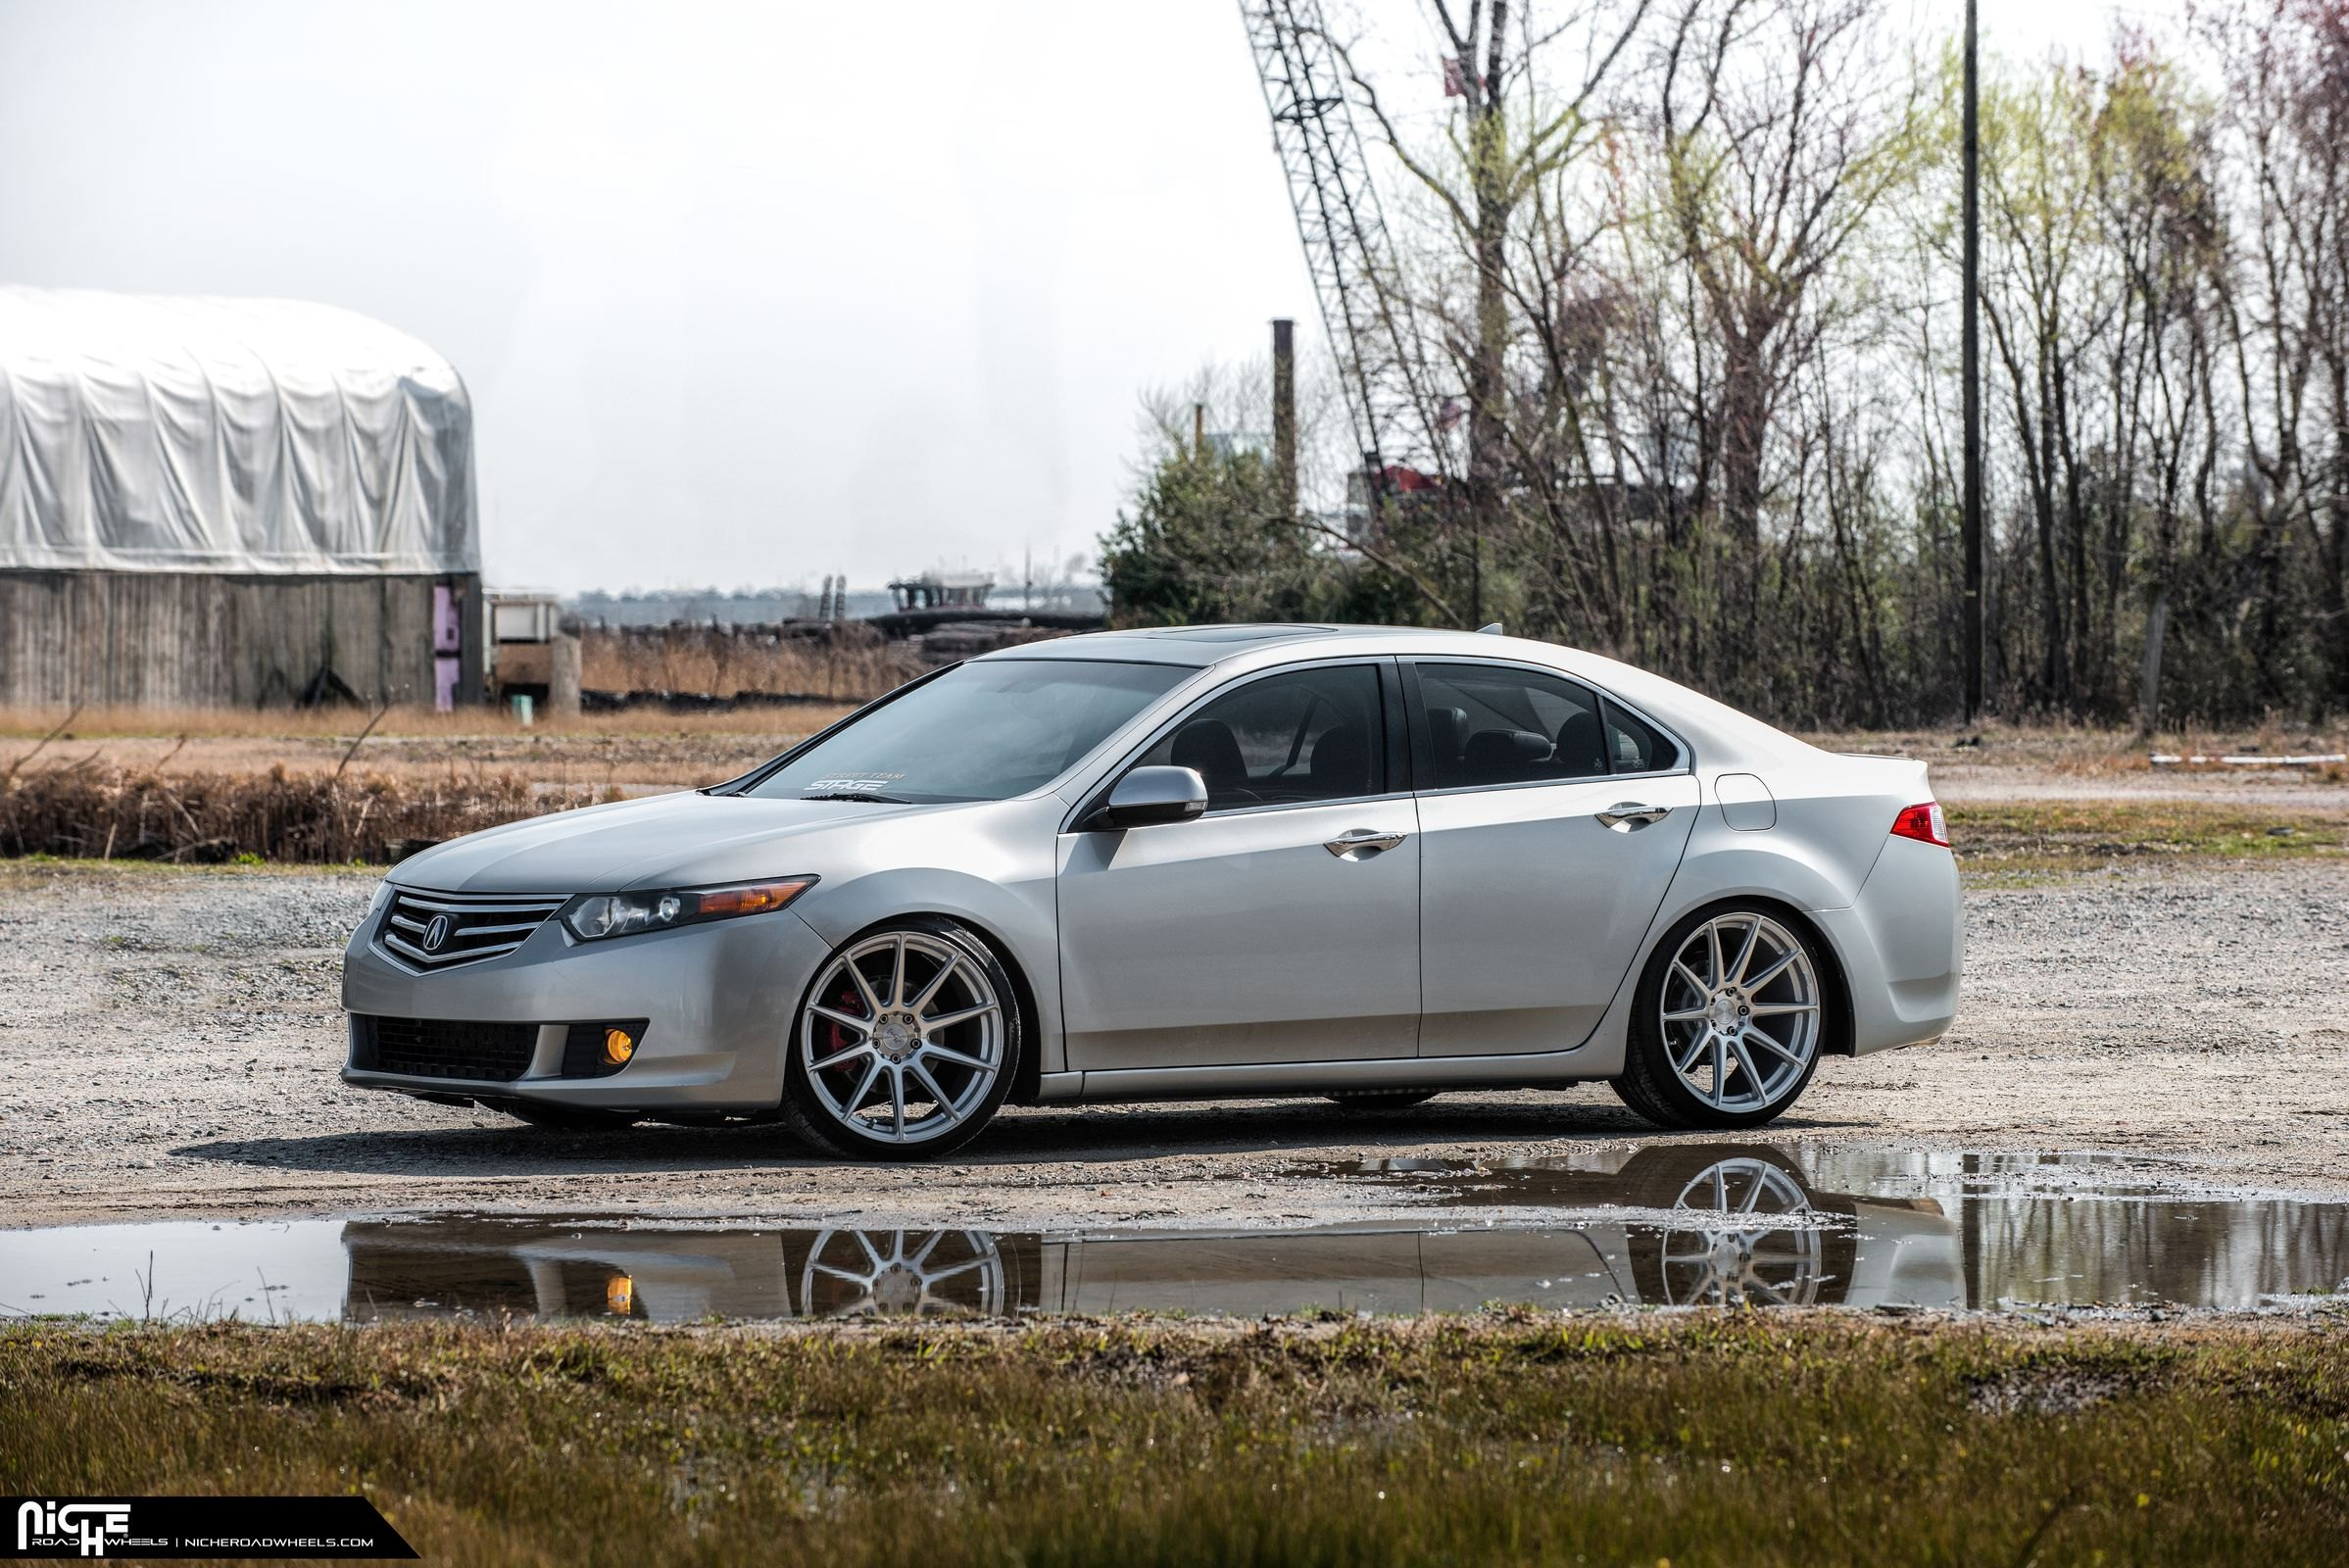 Custom 2011 Acura Tsx Images Mods Photos Upgrades Carid Com Gallery